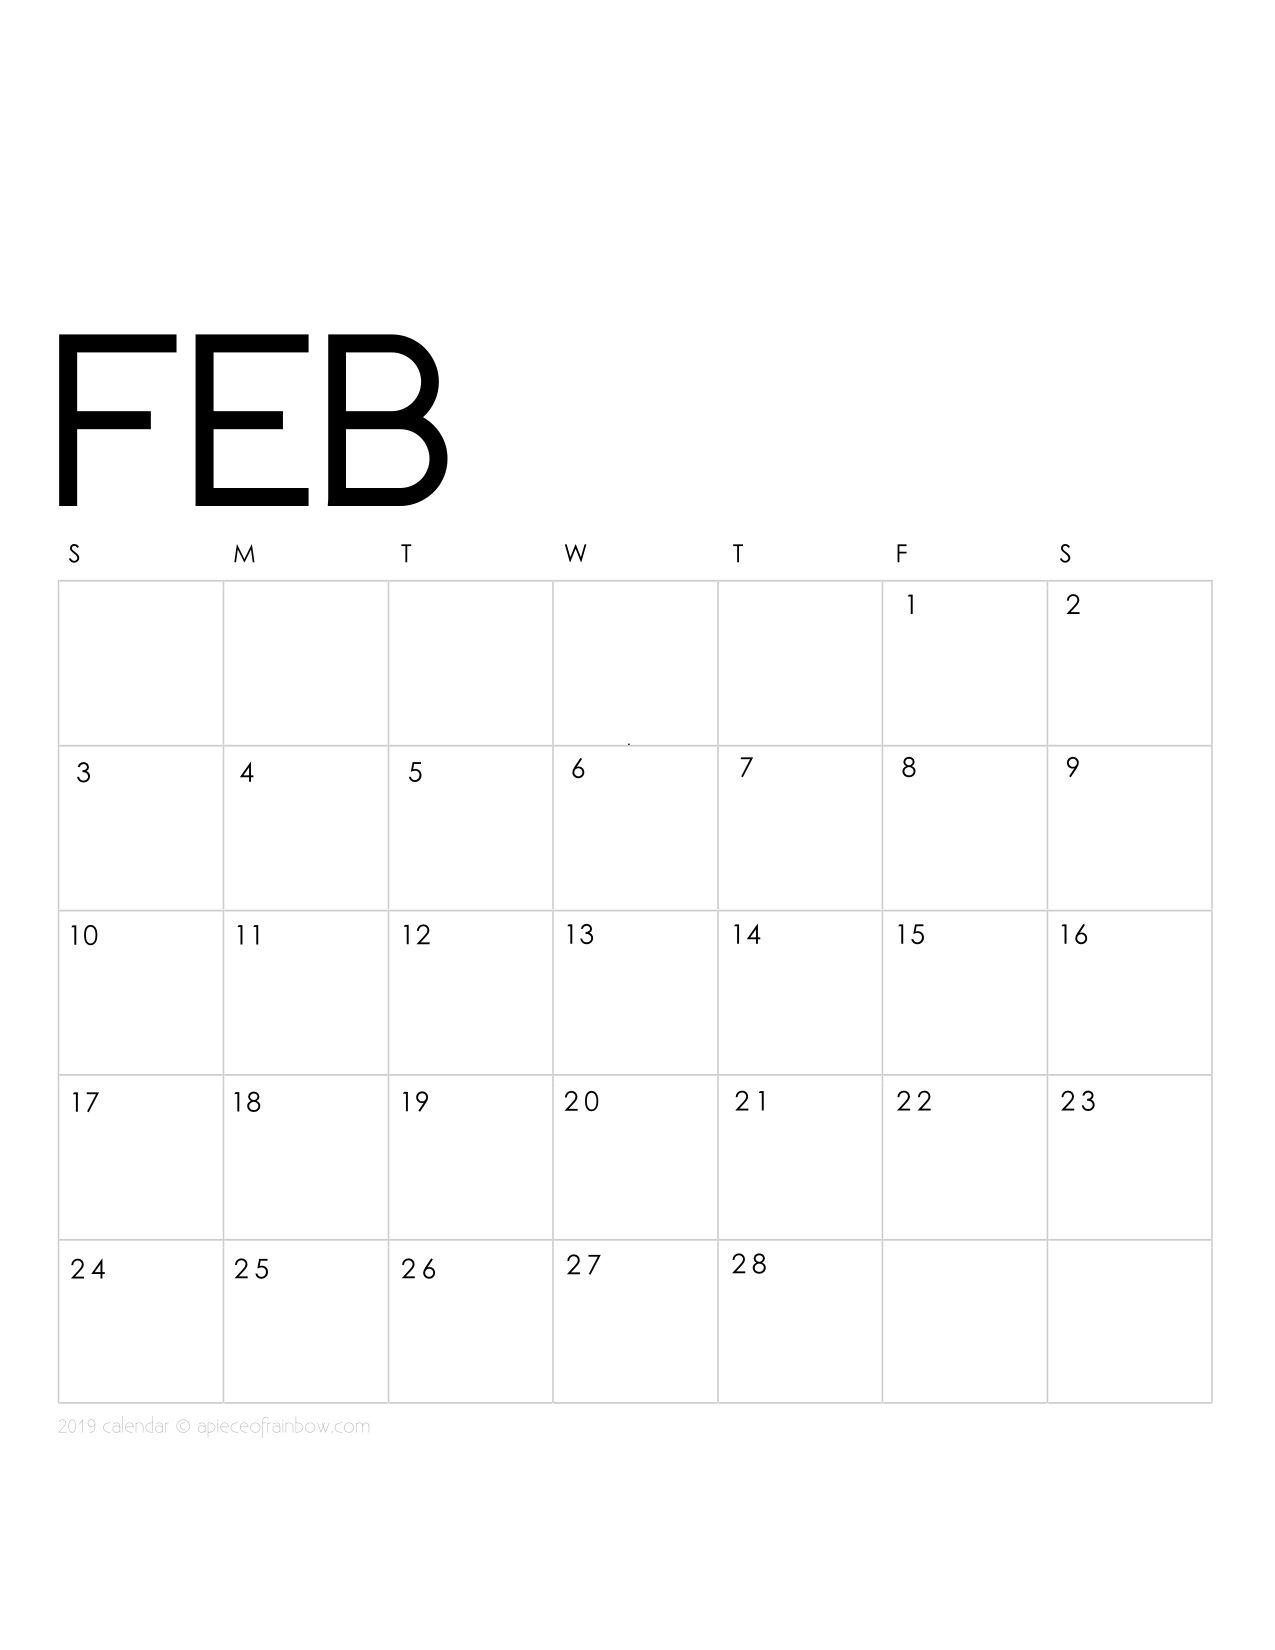 Free Printable February 2019 Calendar For Planning Printable February 2019 Calendar Monthly Planner {2 Designs